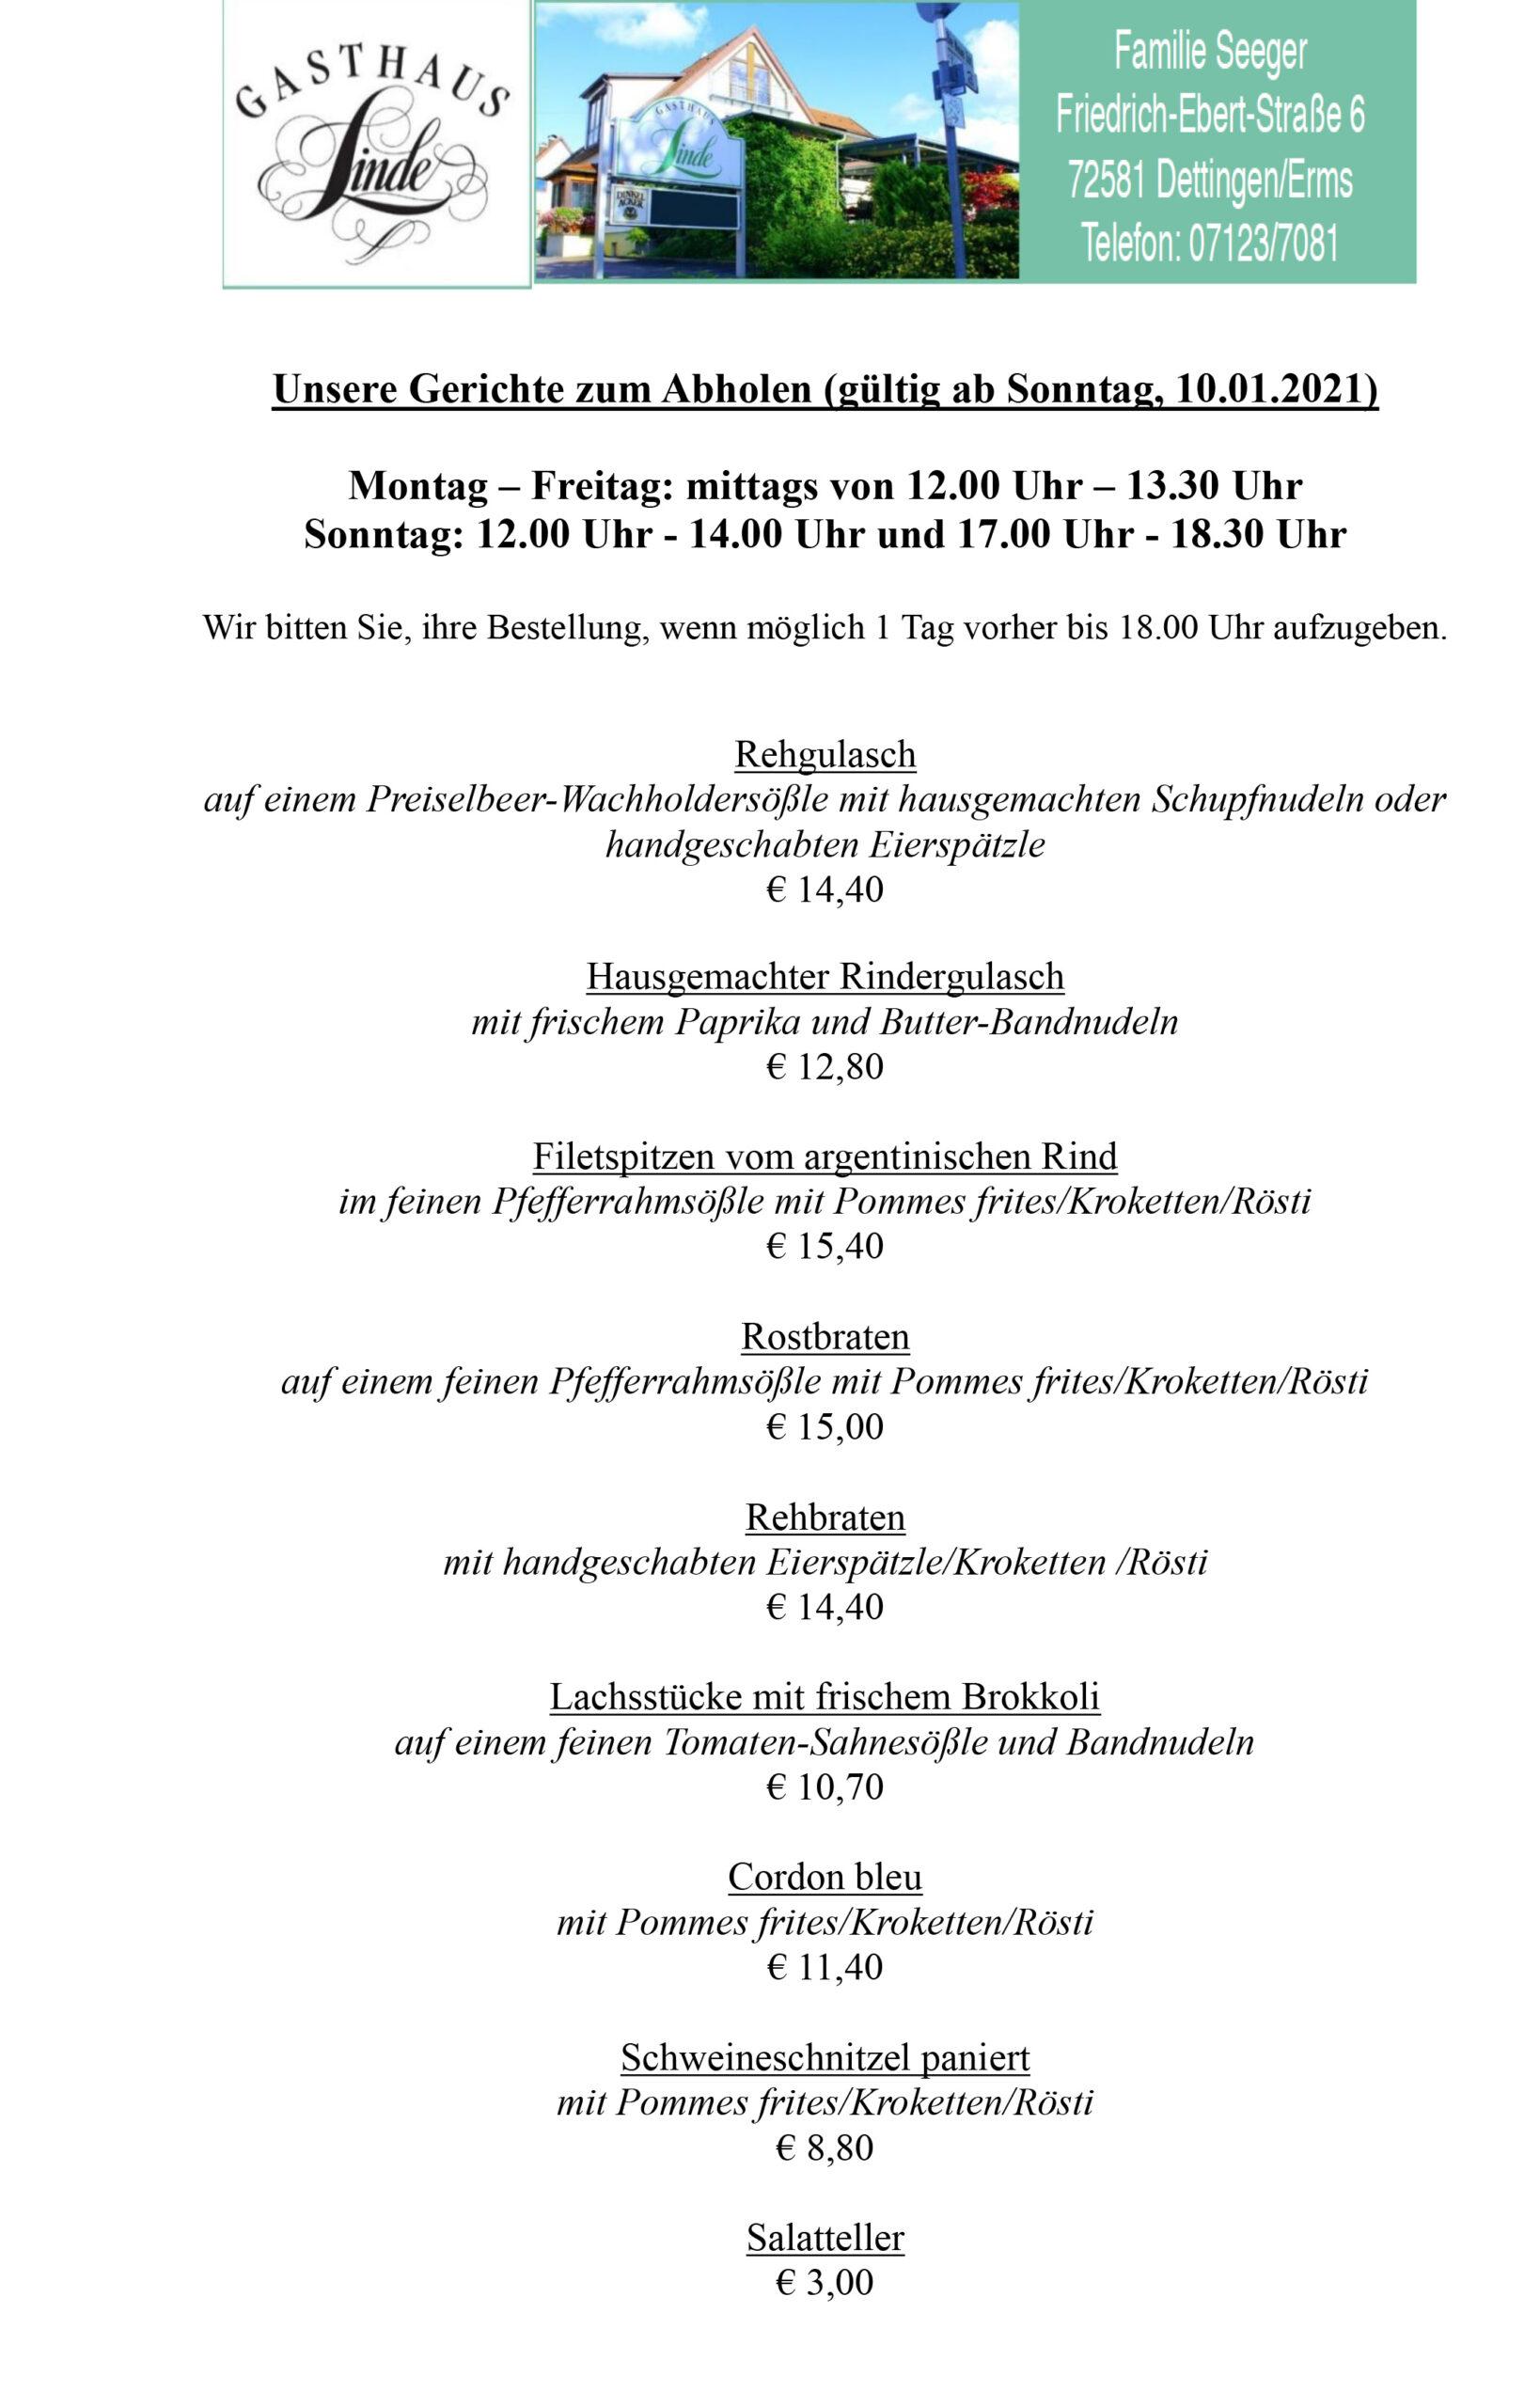 Abholservice-Gasthaus-Linde-Januar-21